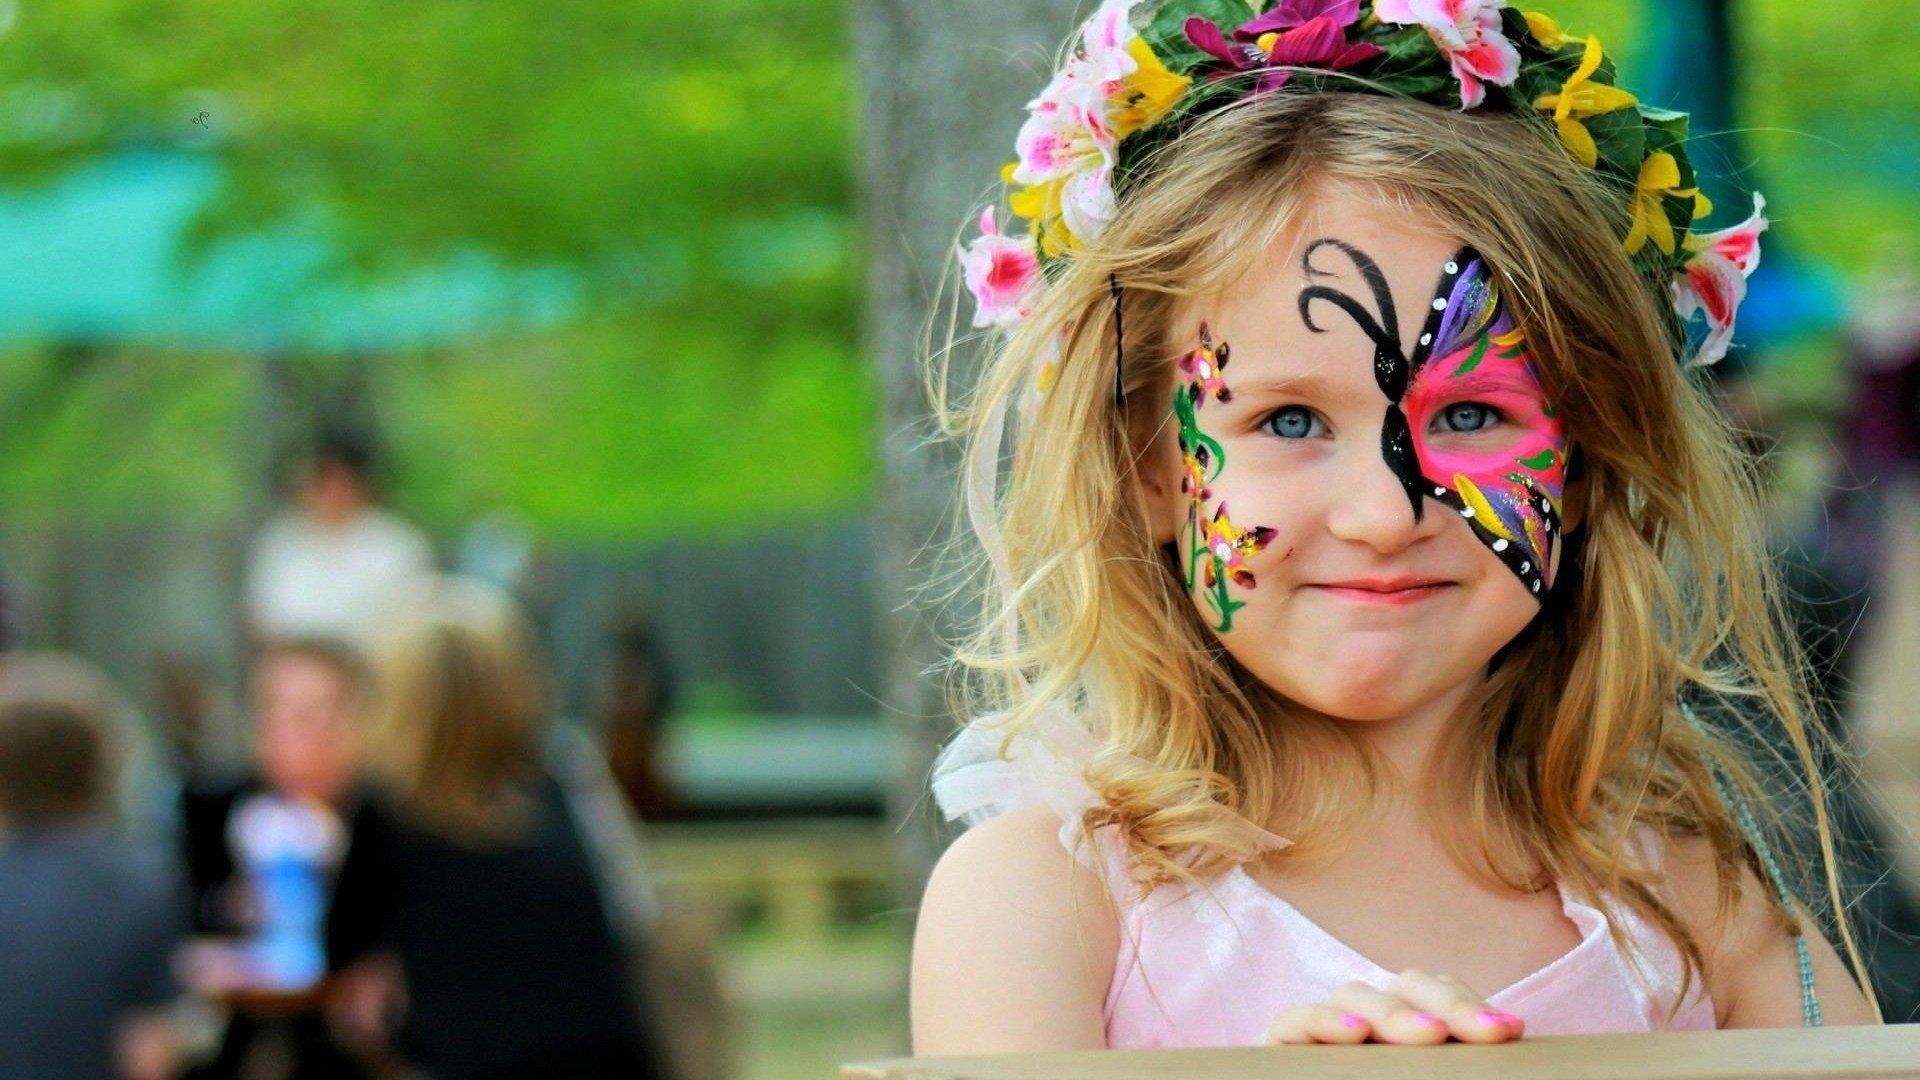 little girl butterfly wallpapers - photo #45